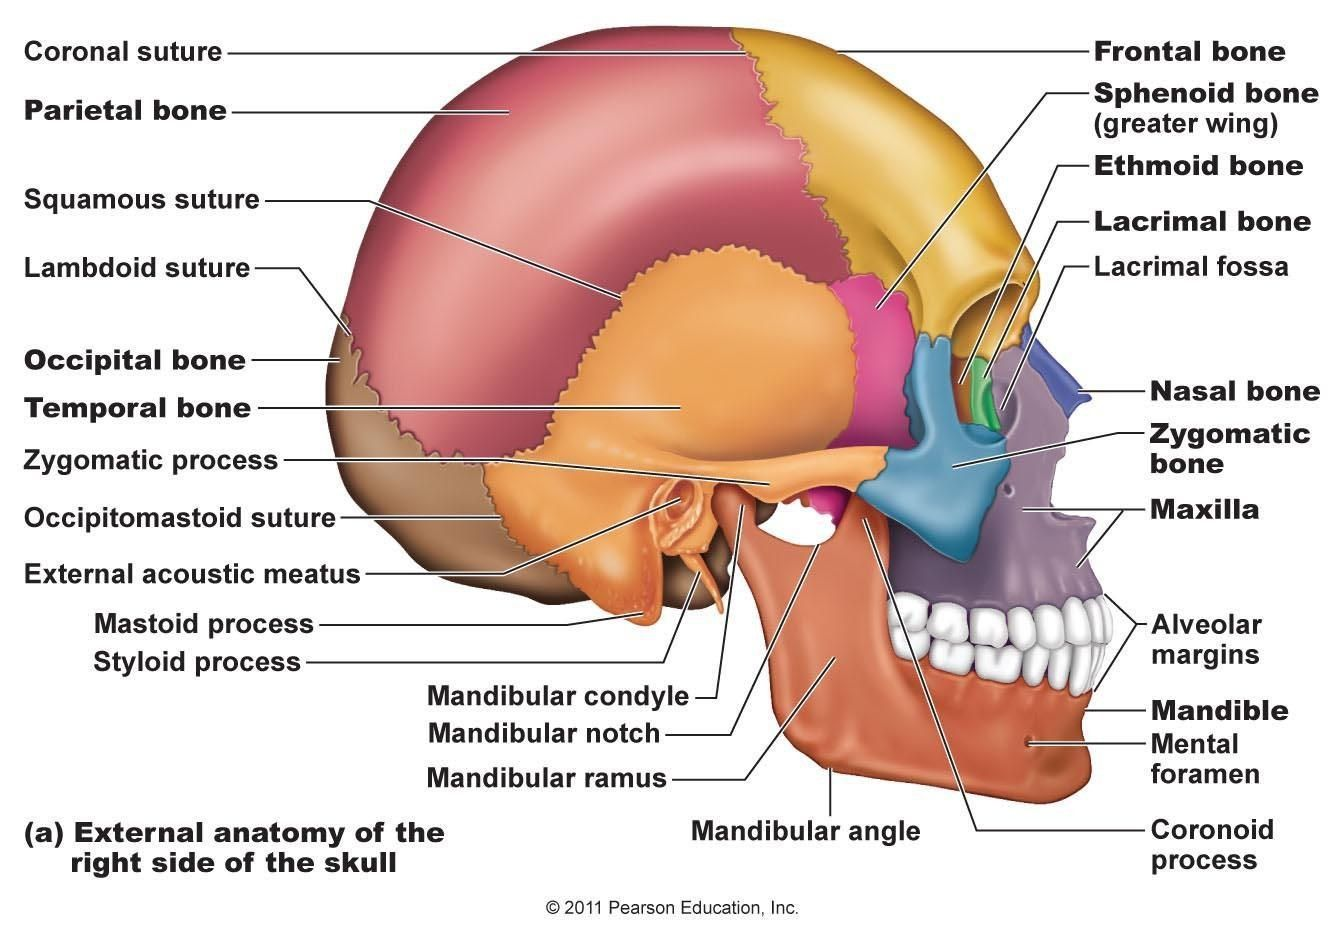 hight resolution of ethmoid bone diagram ethmoid bone diagram diagram of the skull bones diagram of the skull